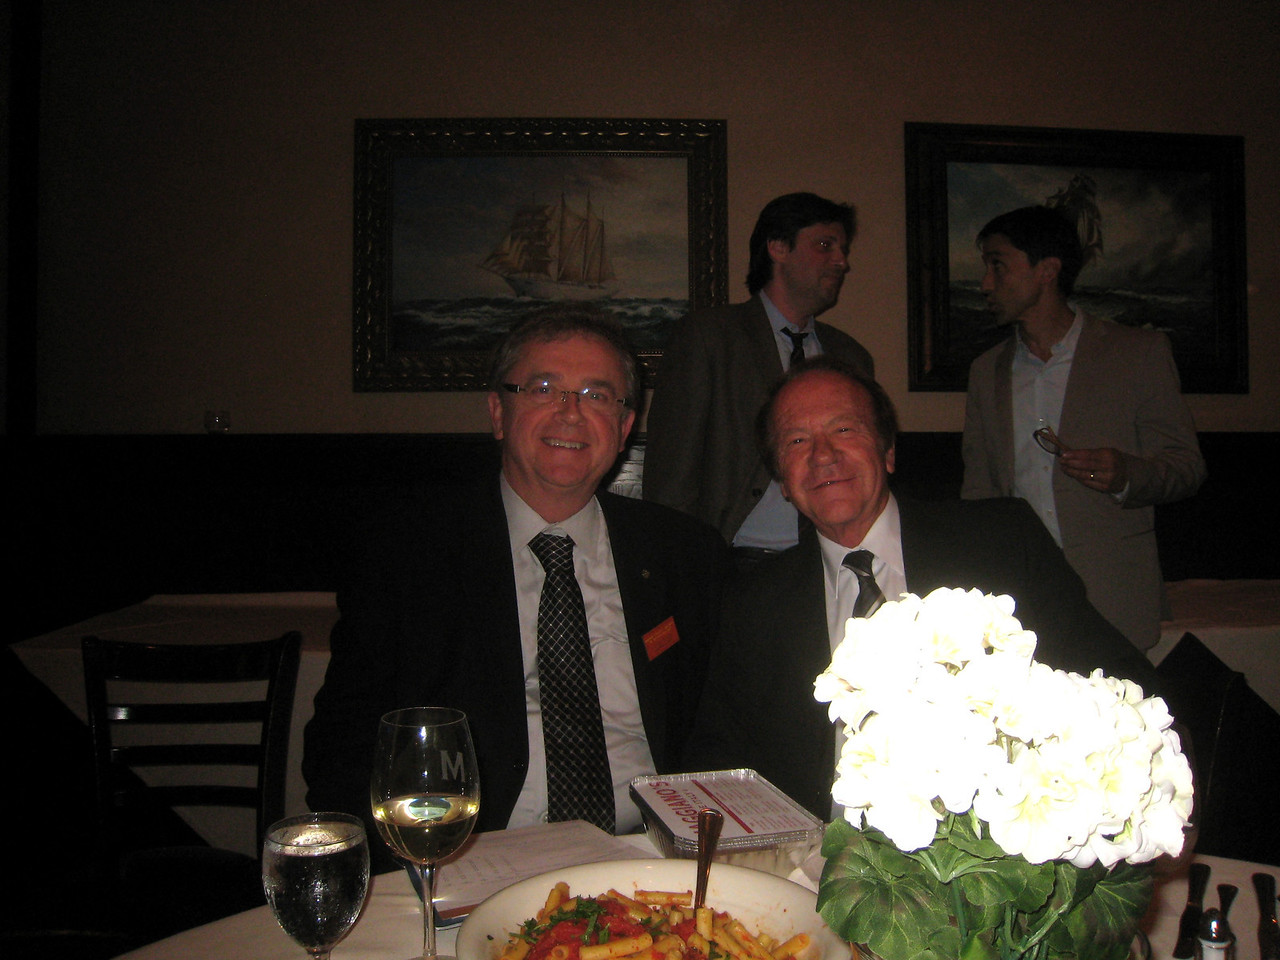 Jim Boyce & Robt Ruper